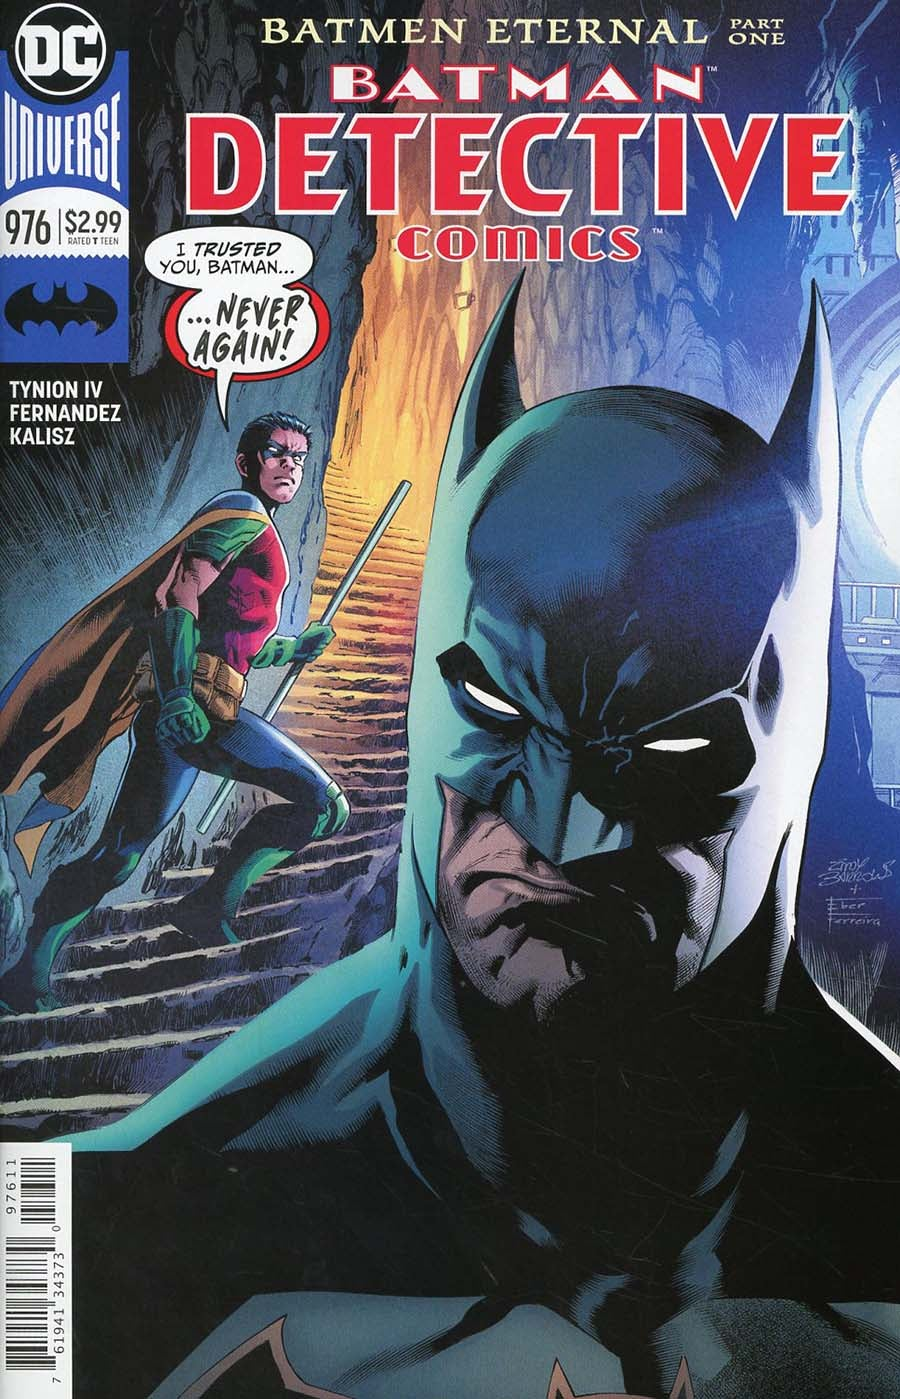 Batmen Eternal Part 1